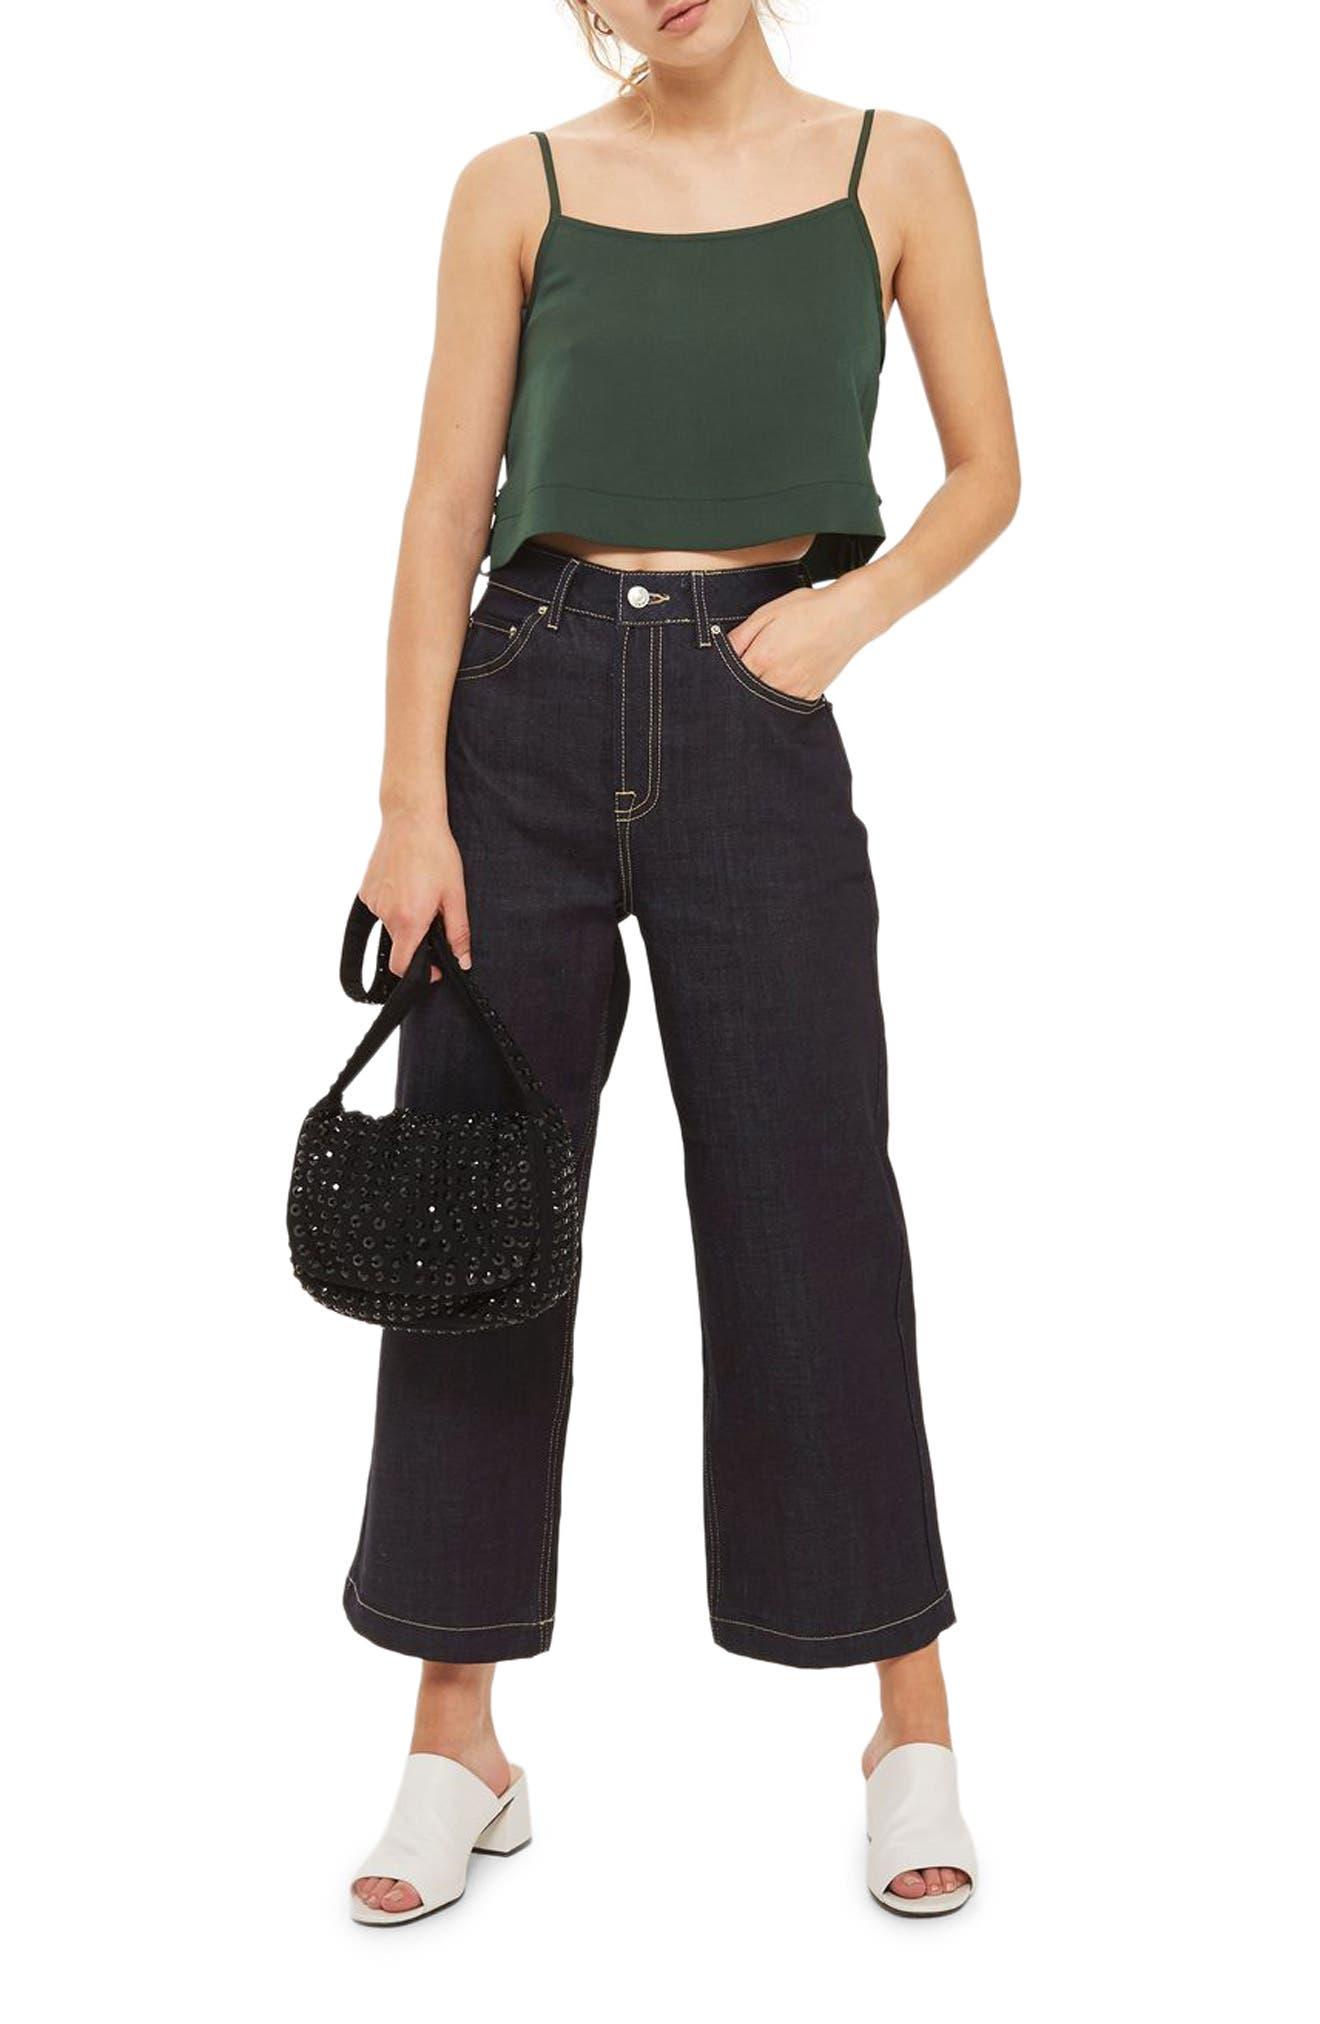 Alternate Image 1 Selected - Topshop Side Tie Crop Camisole